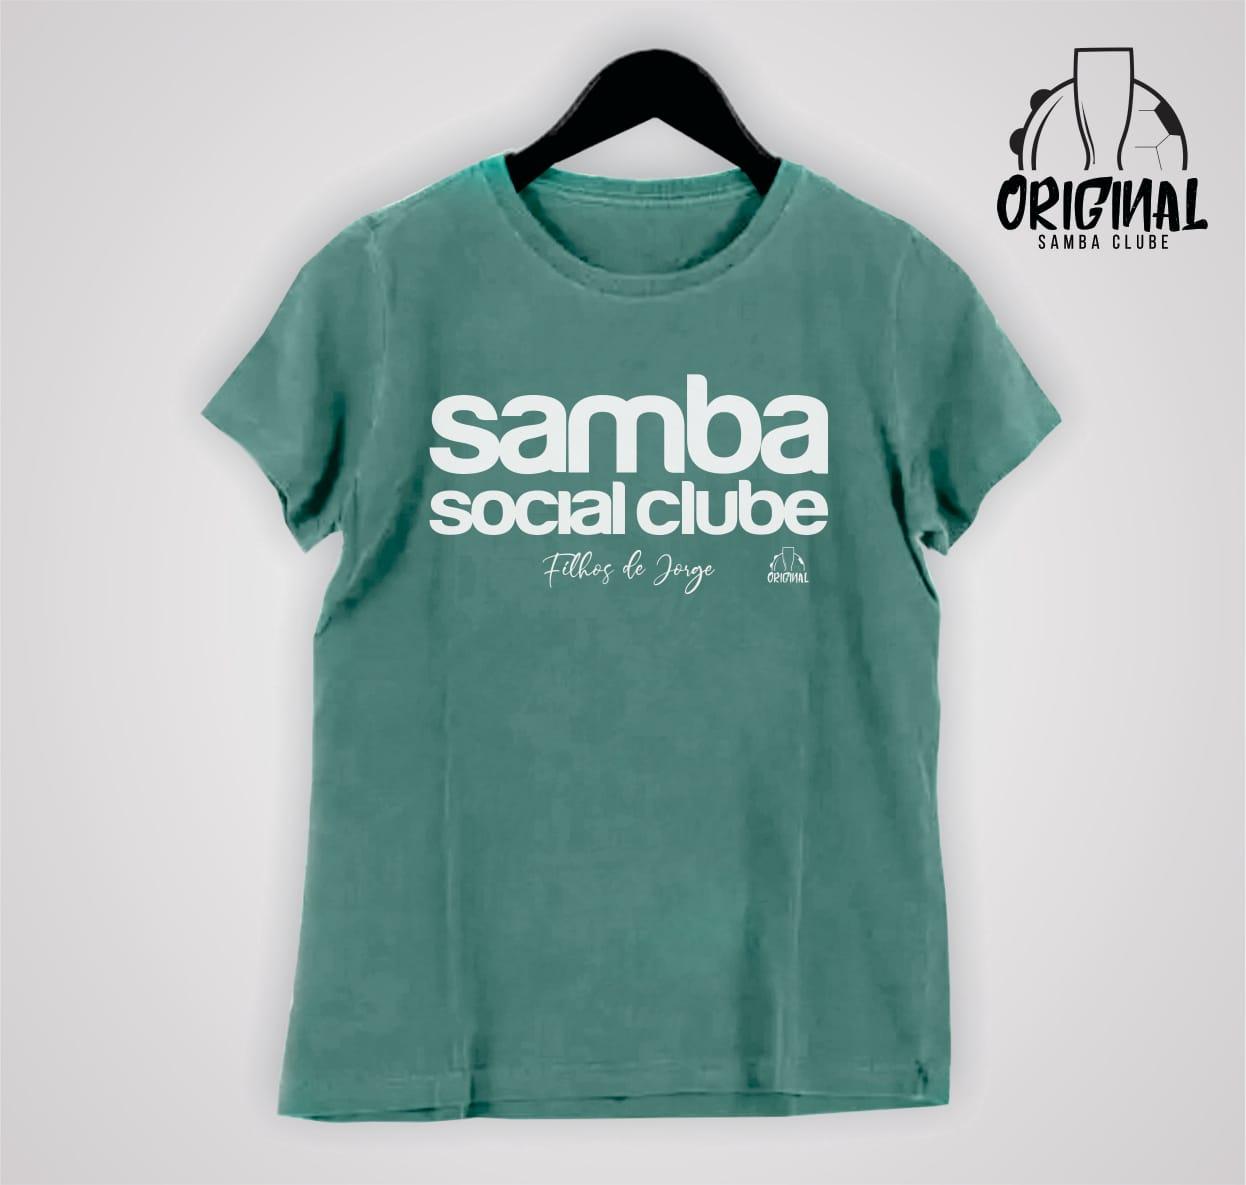 Camiseta Feminina Filhos de Jorge - Samba Social Clube